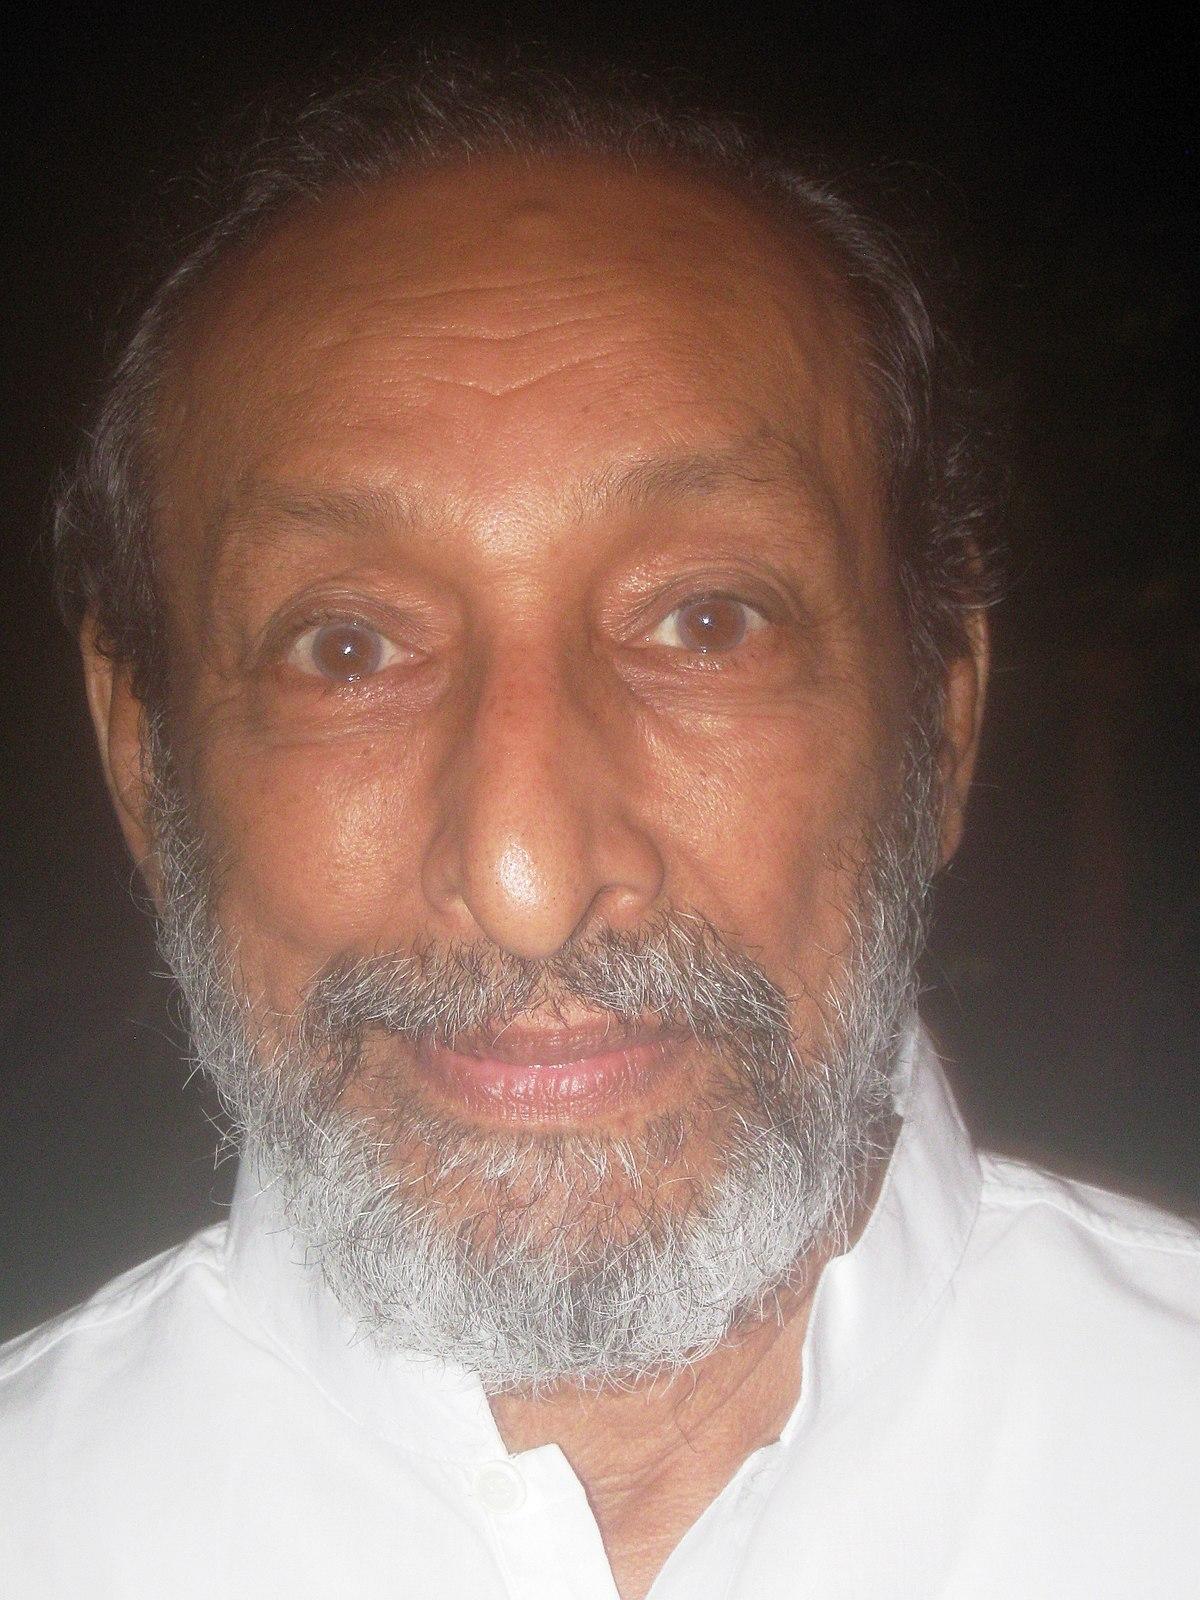 Vasudeva Nanayakkara - Wikipedia